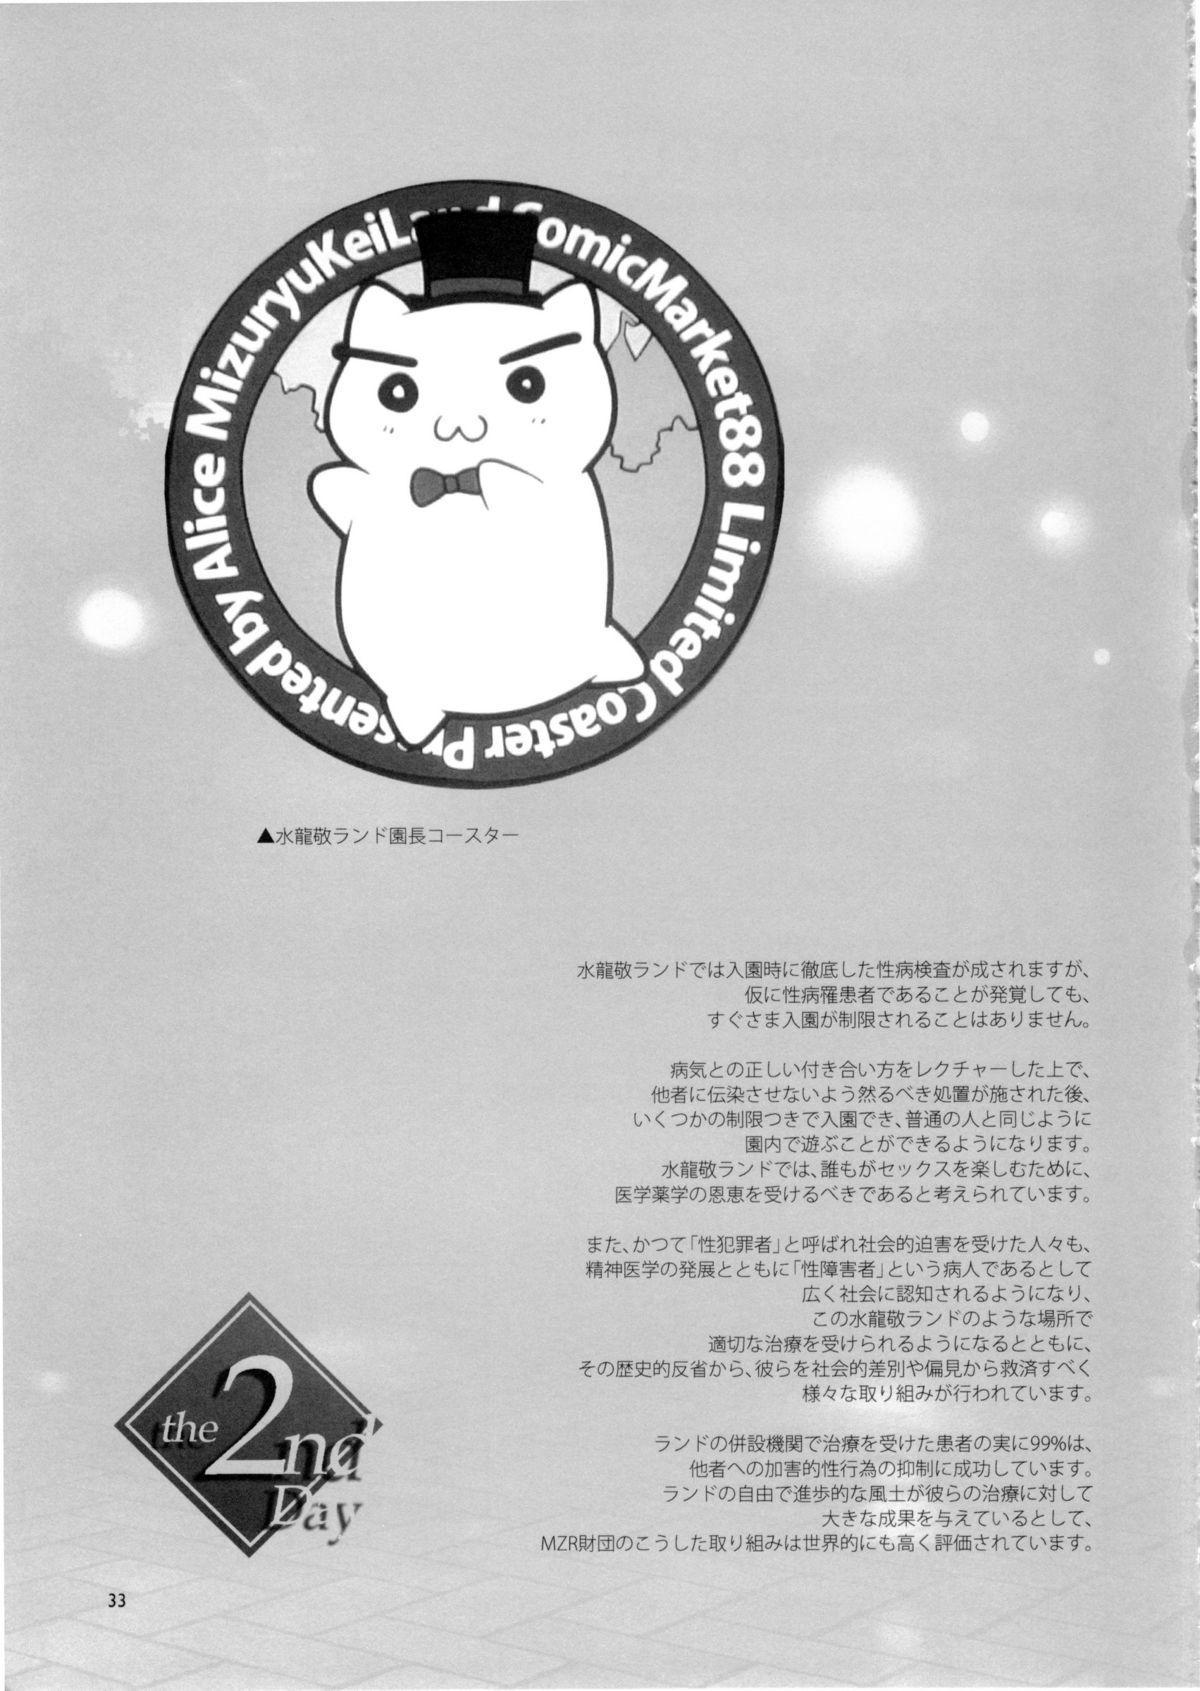 Oideyo! Mizuryu Kei Land the 2nd Day 32